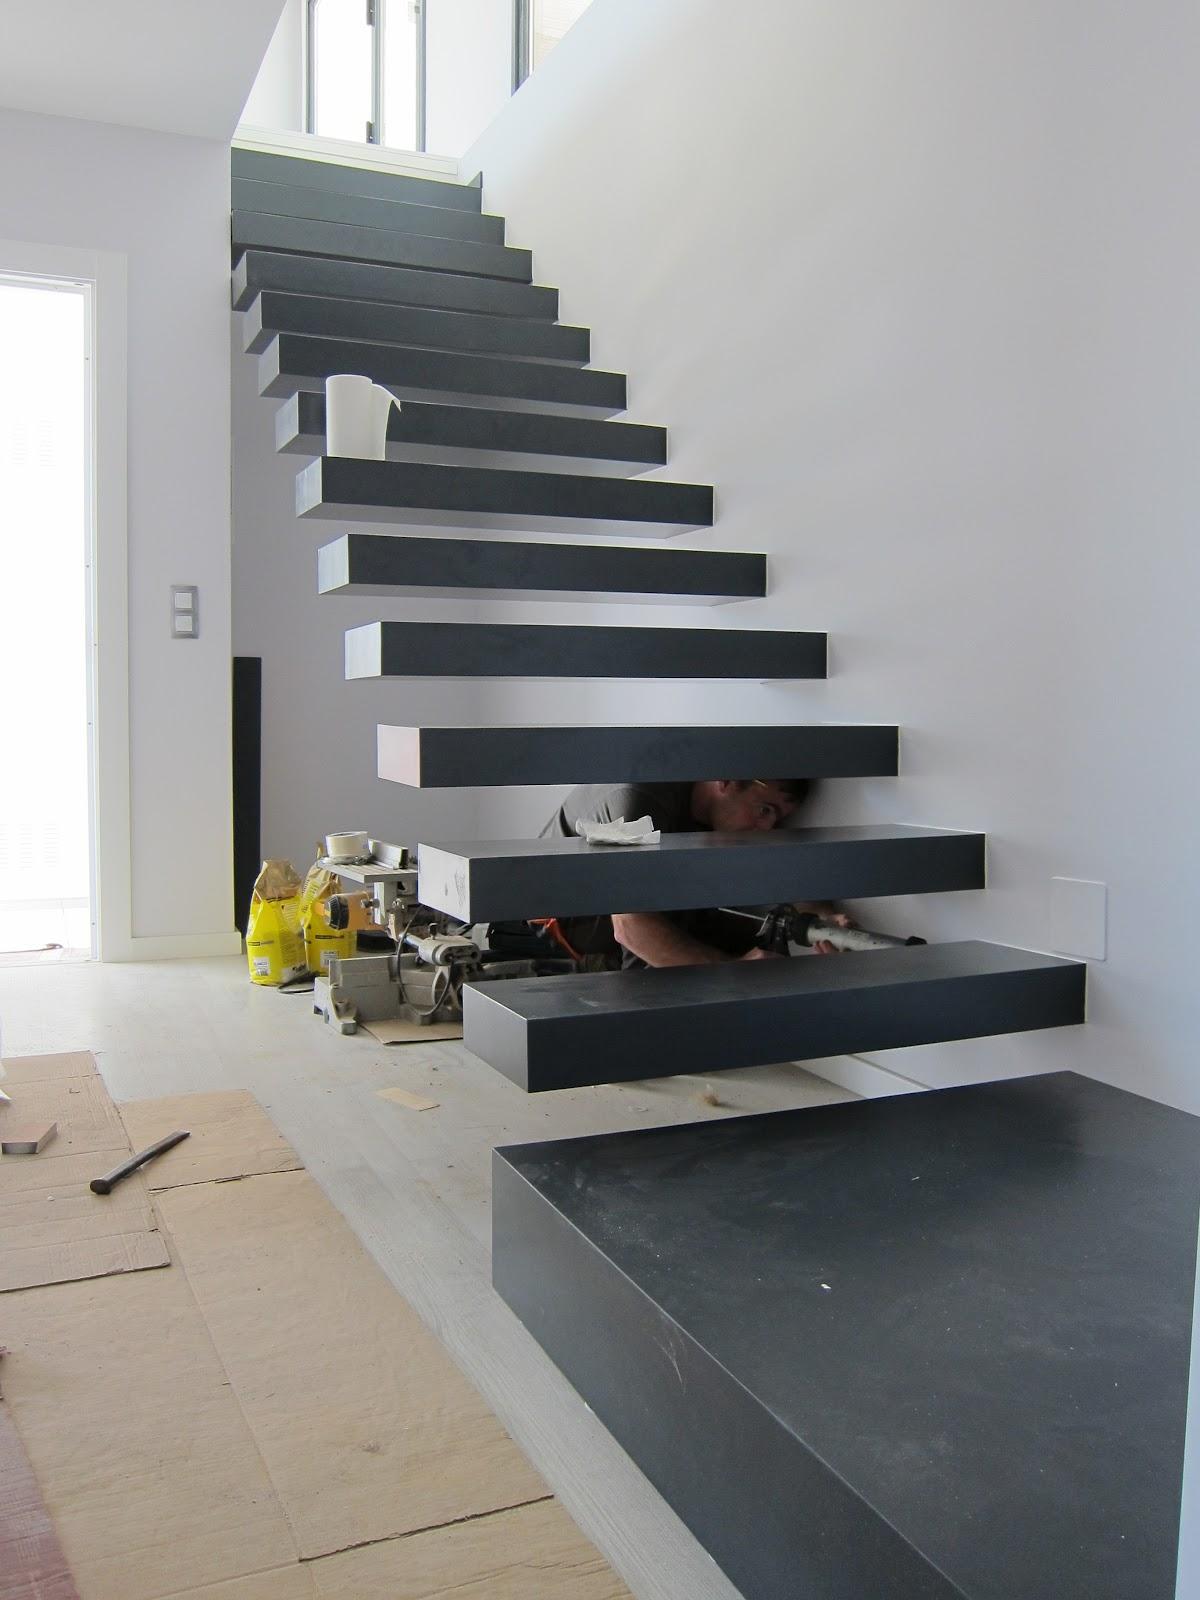 Carpinter a y toneler a escalera al aire - Escaleras al aire ...